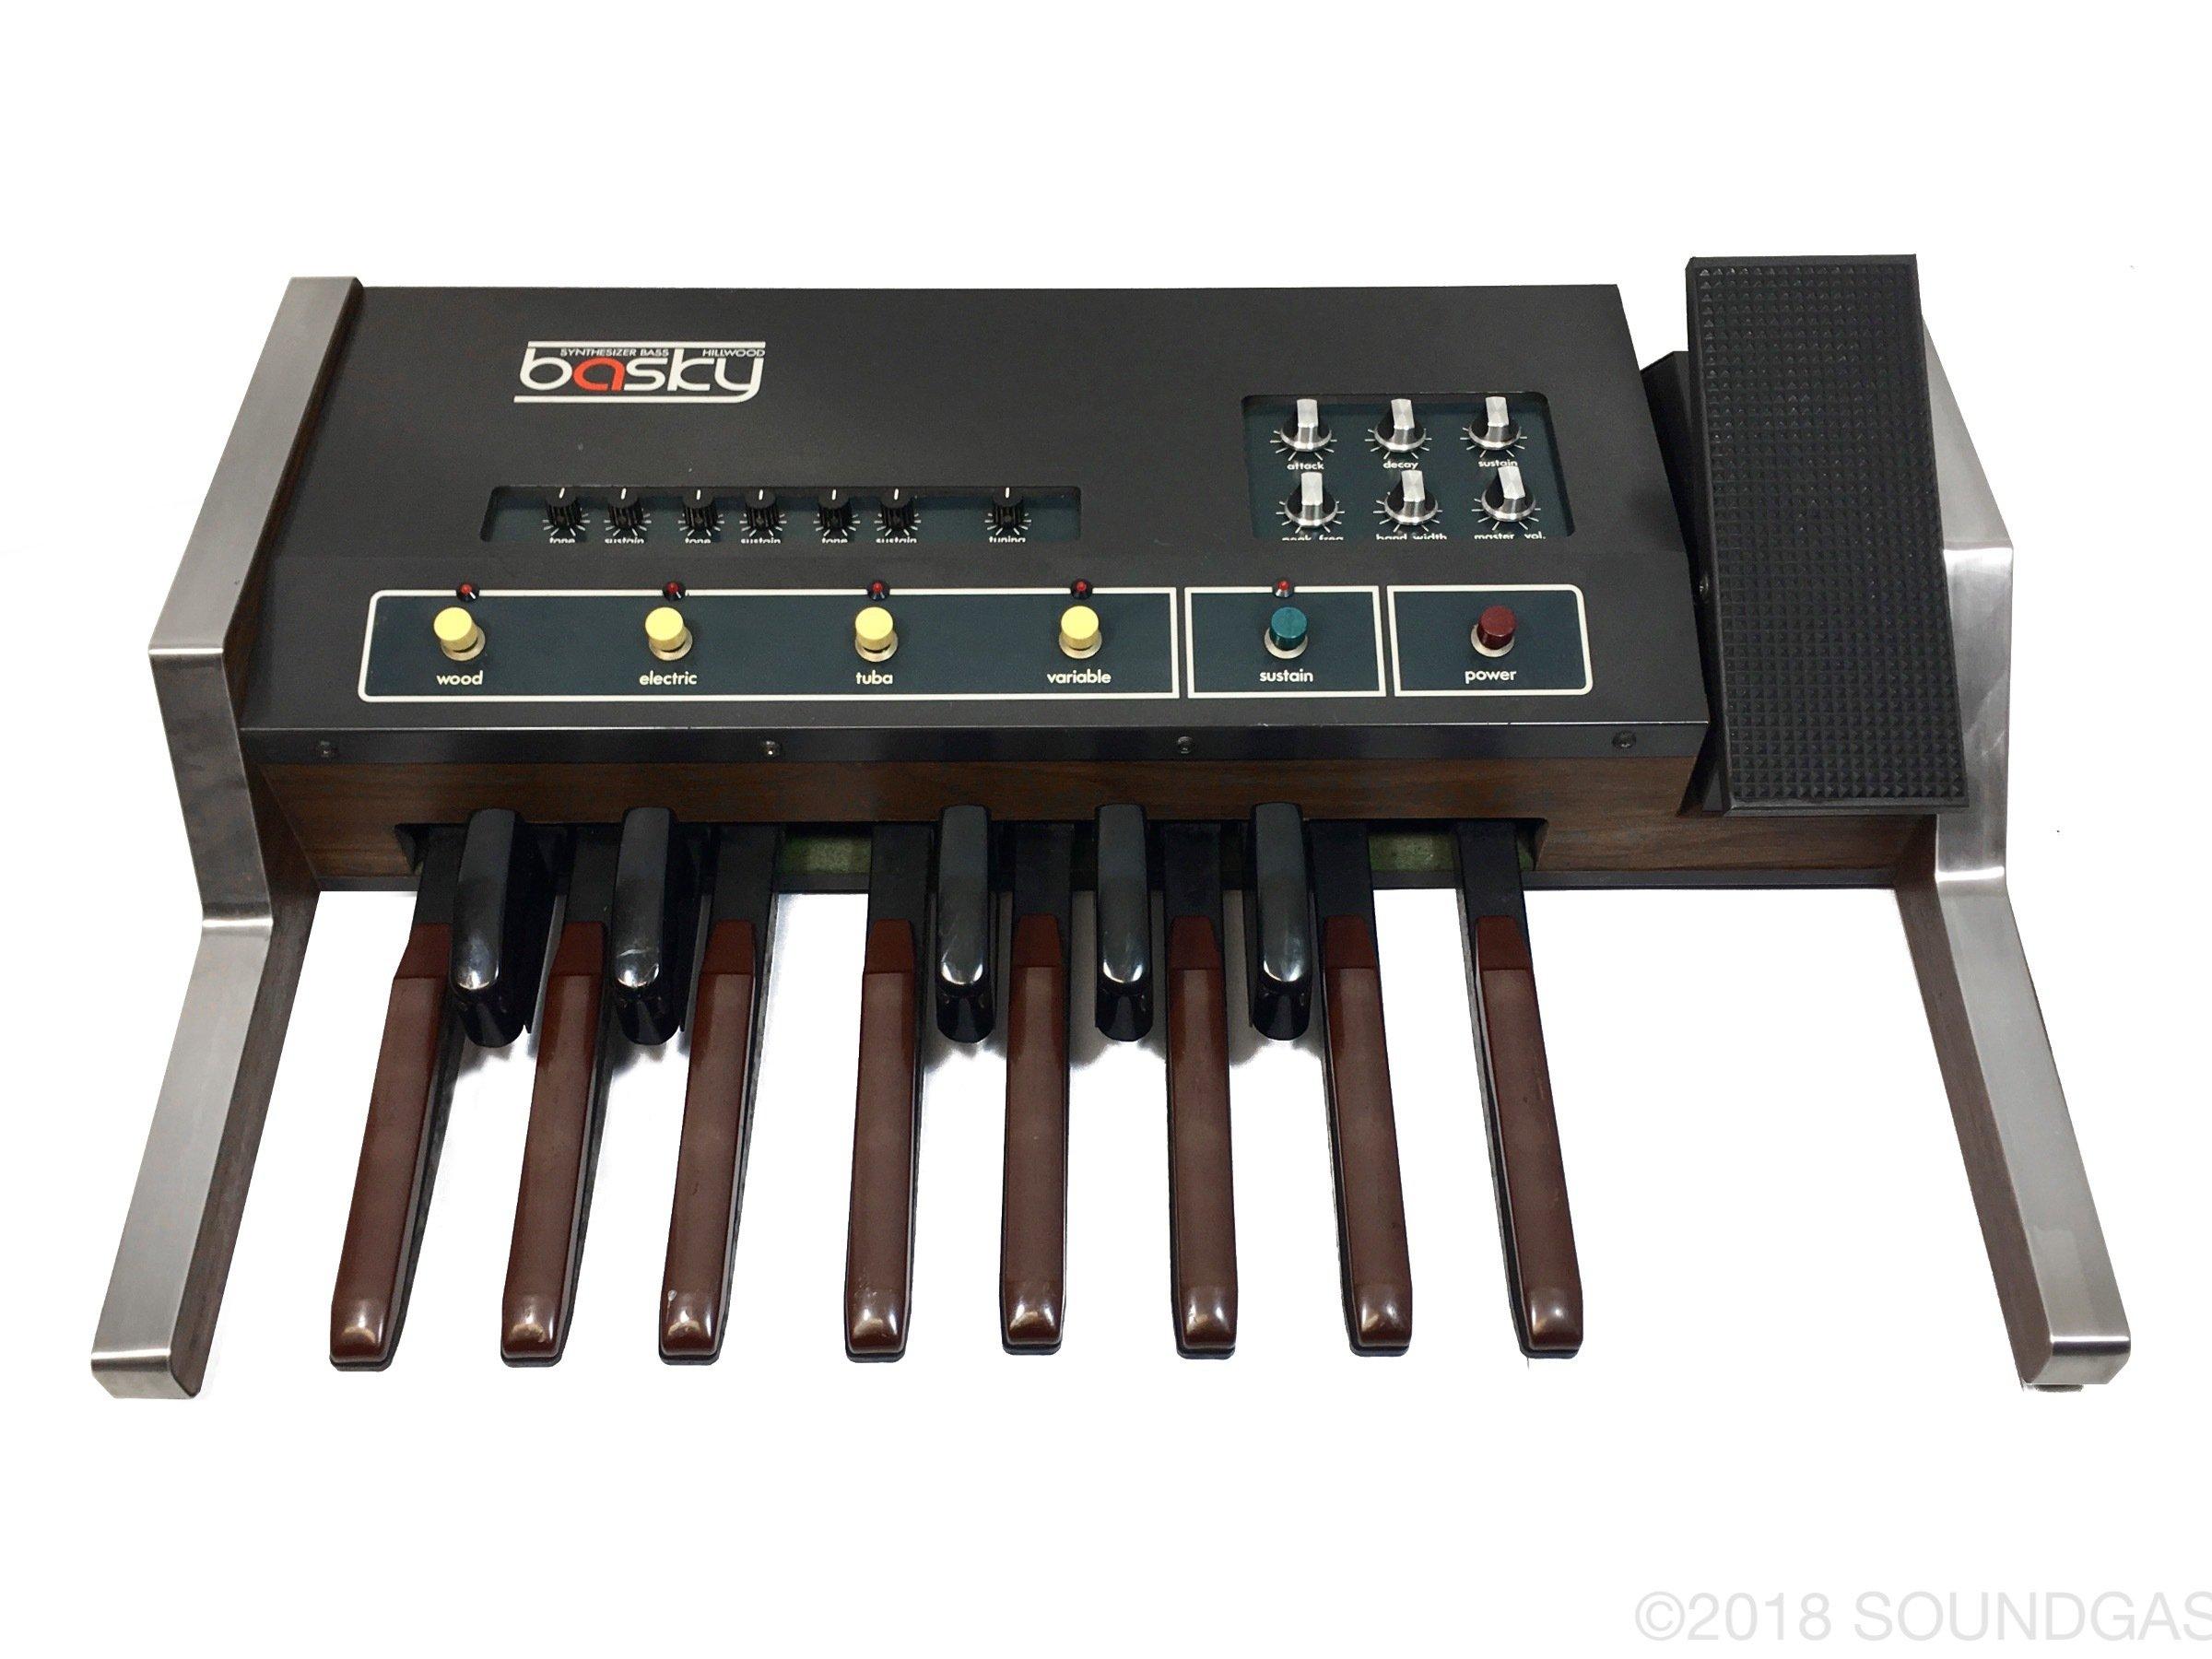 Basky Model BS-4355 Bass Synthesizer